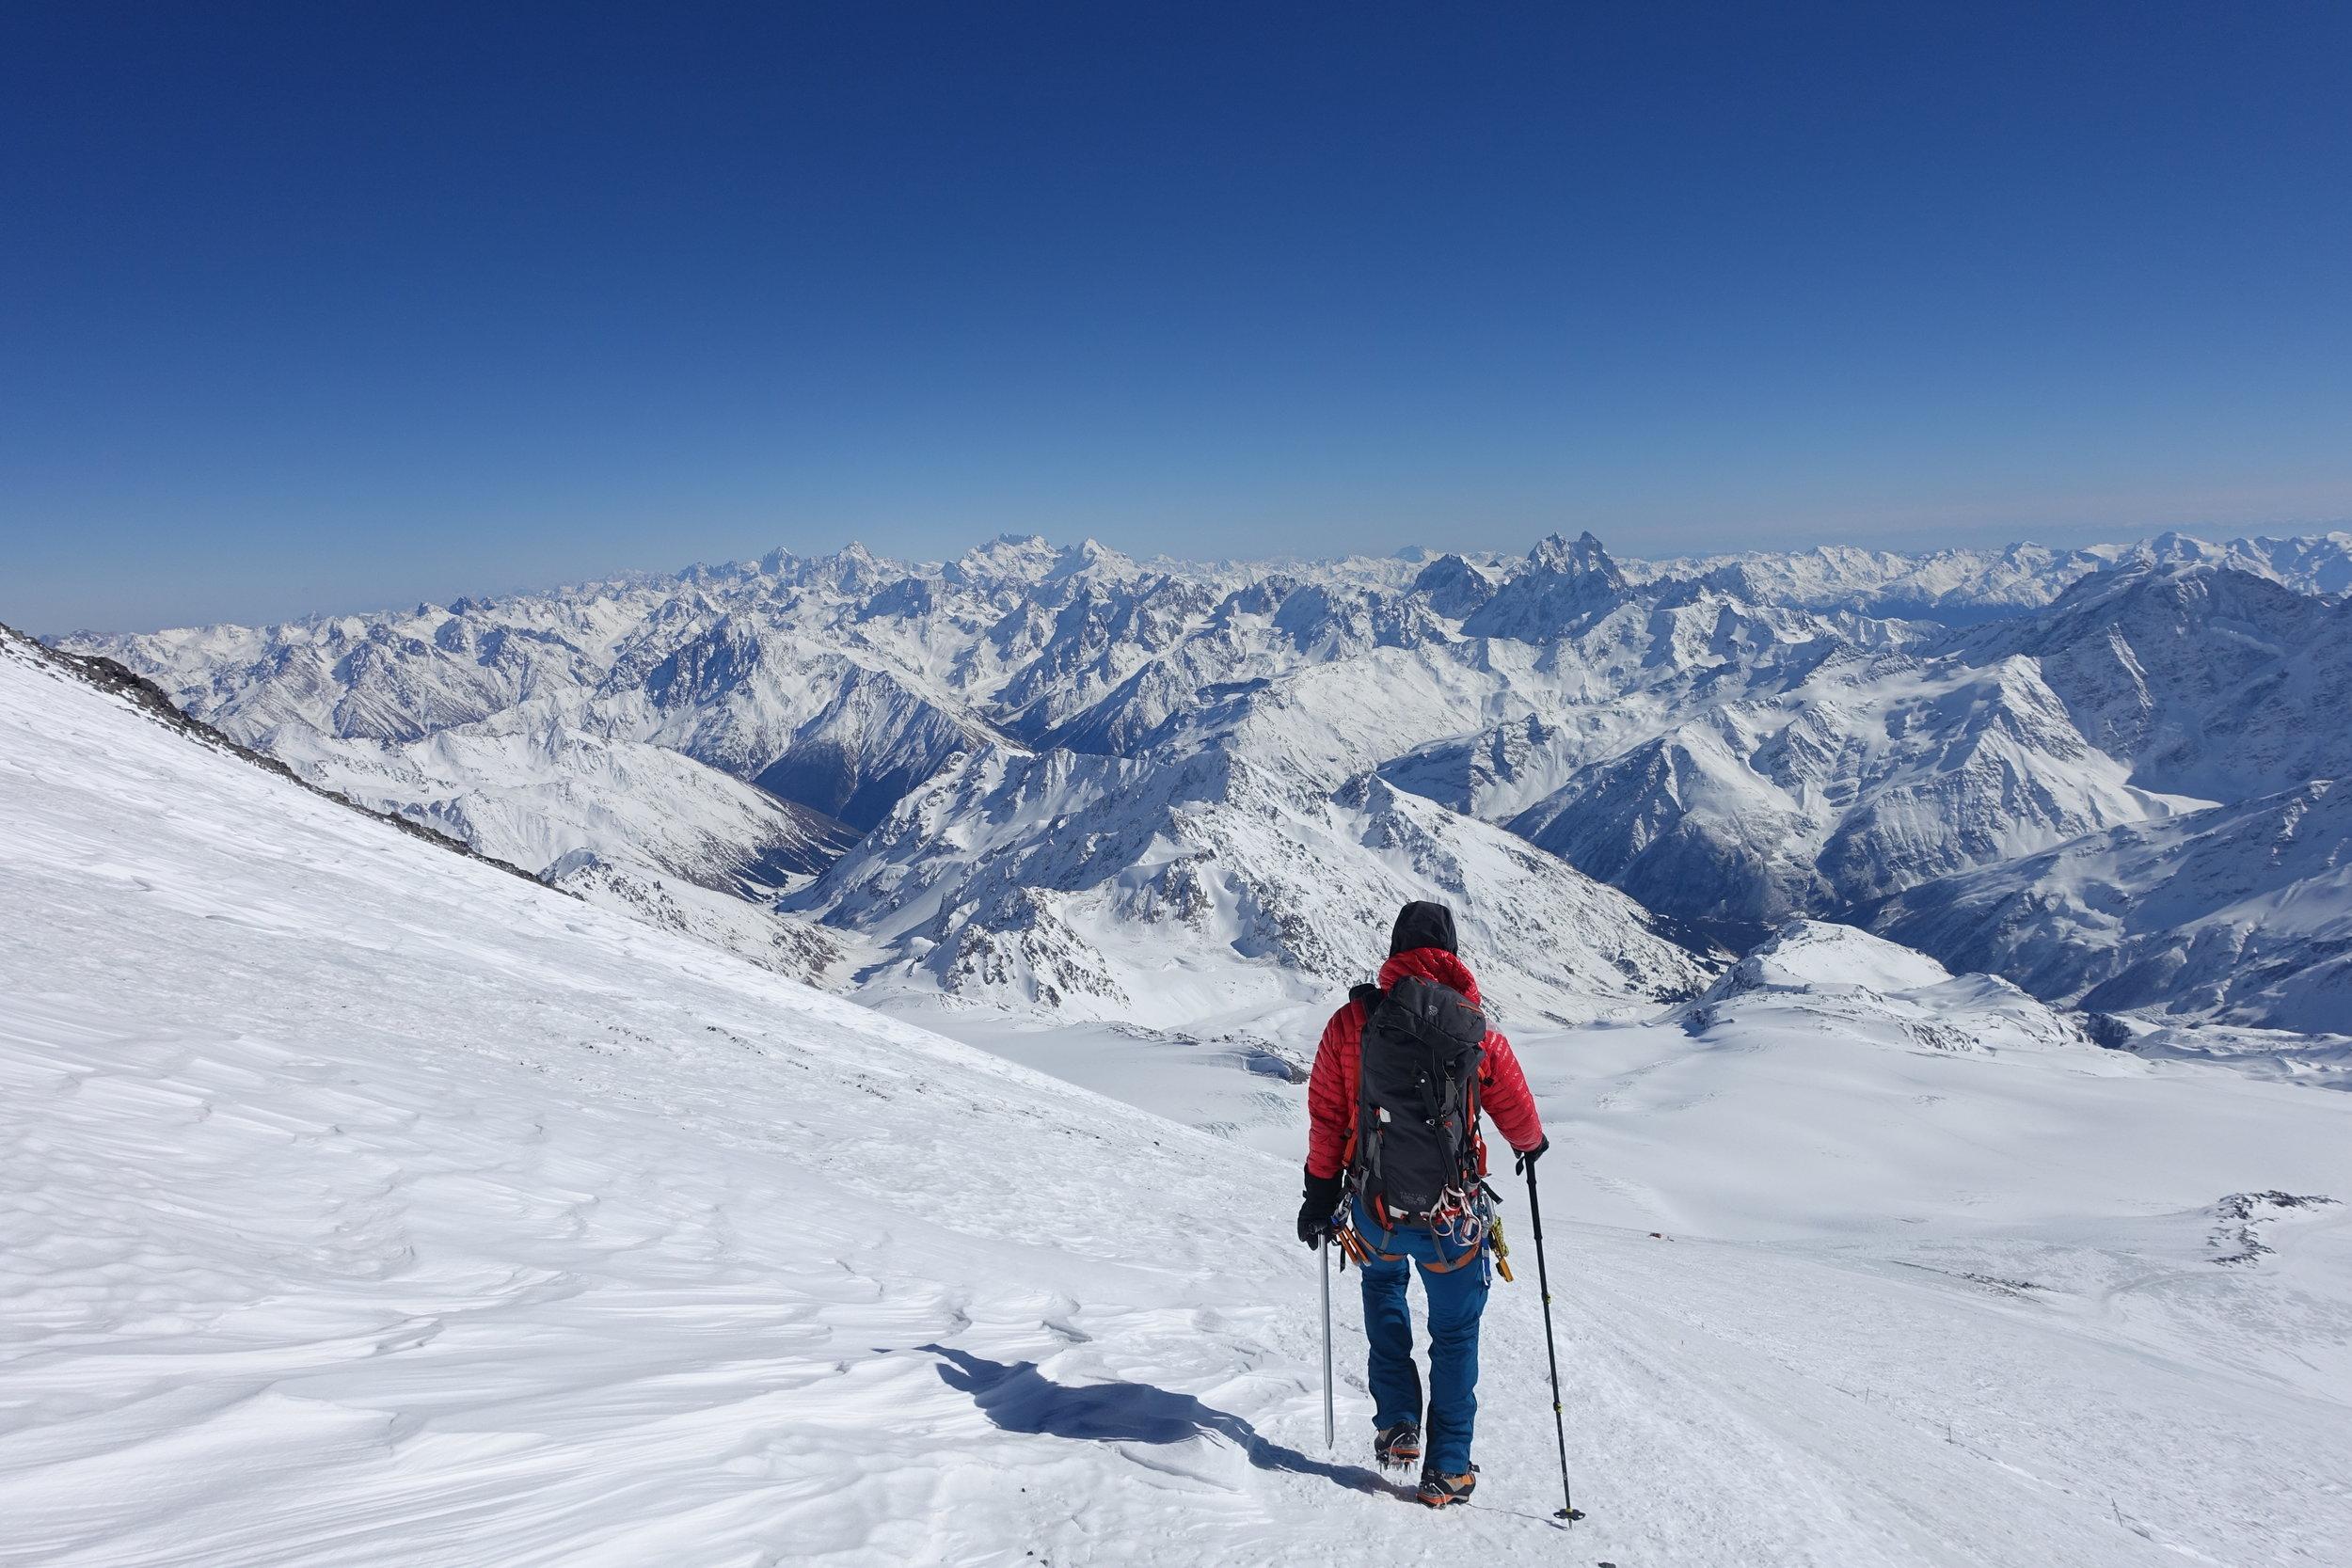 Descending Russia's Mt. Elbrus. A stunning climb in the Caucasus mountain range.